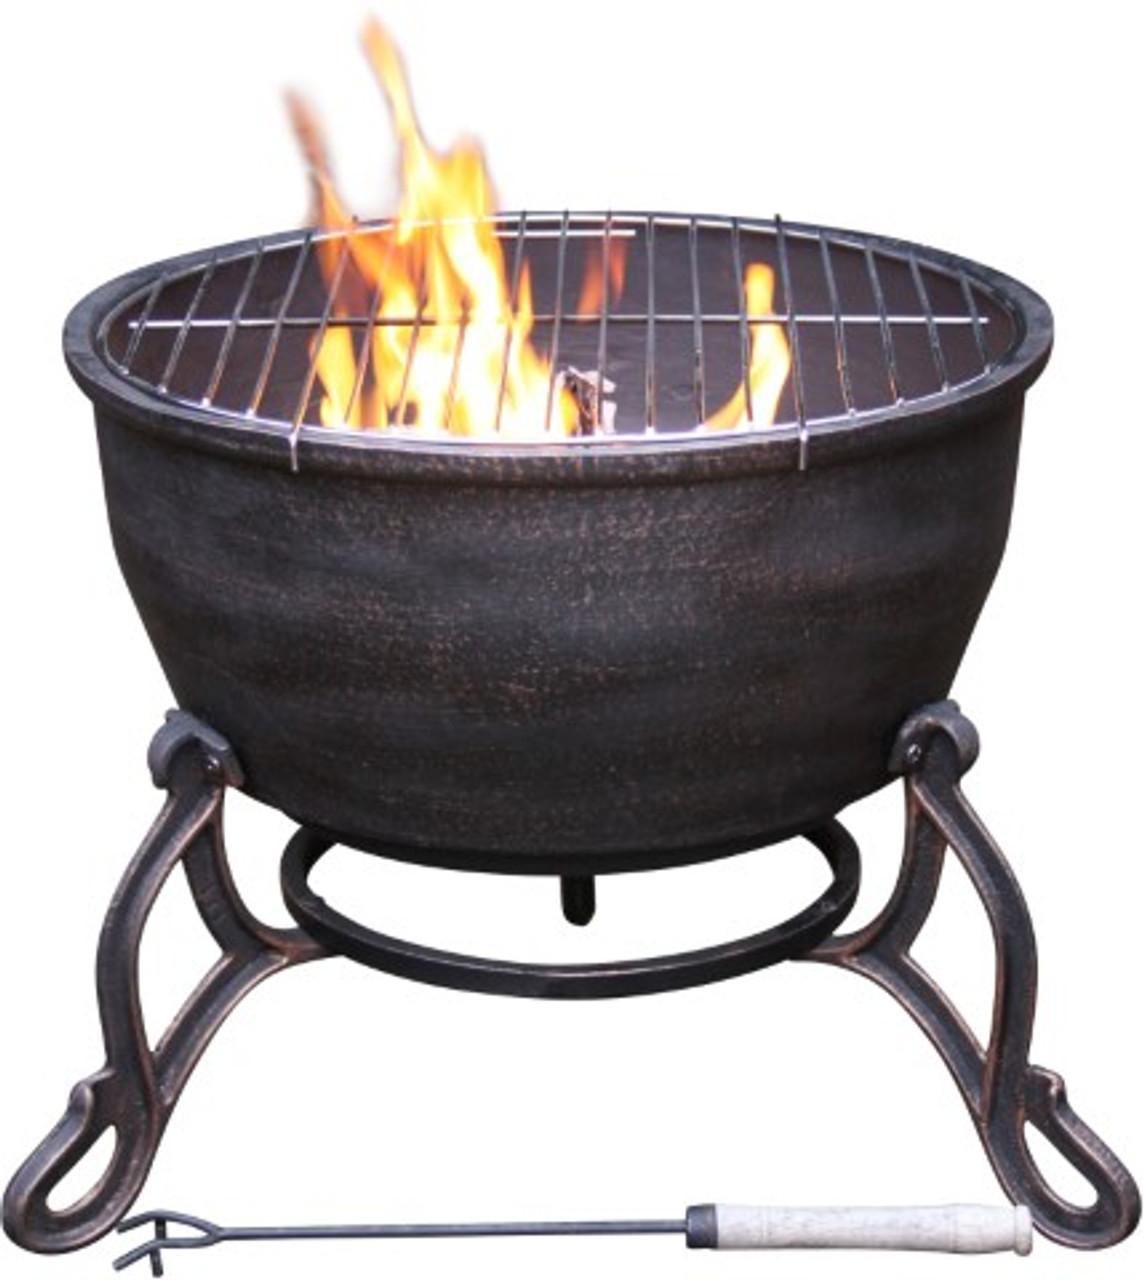 Elidir Cast Iron Fire Bowl